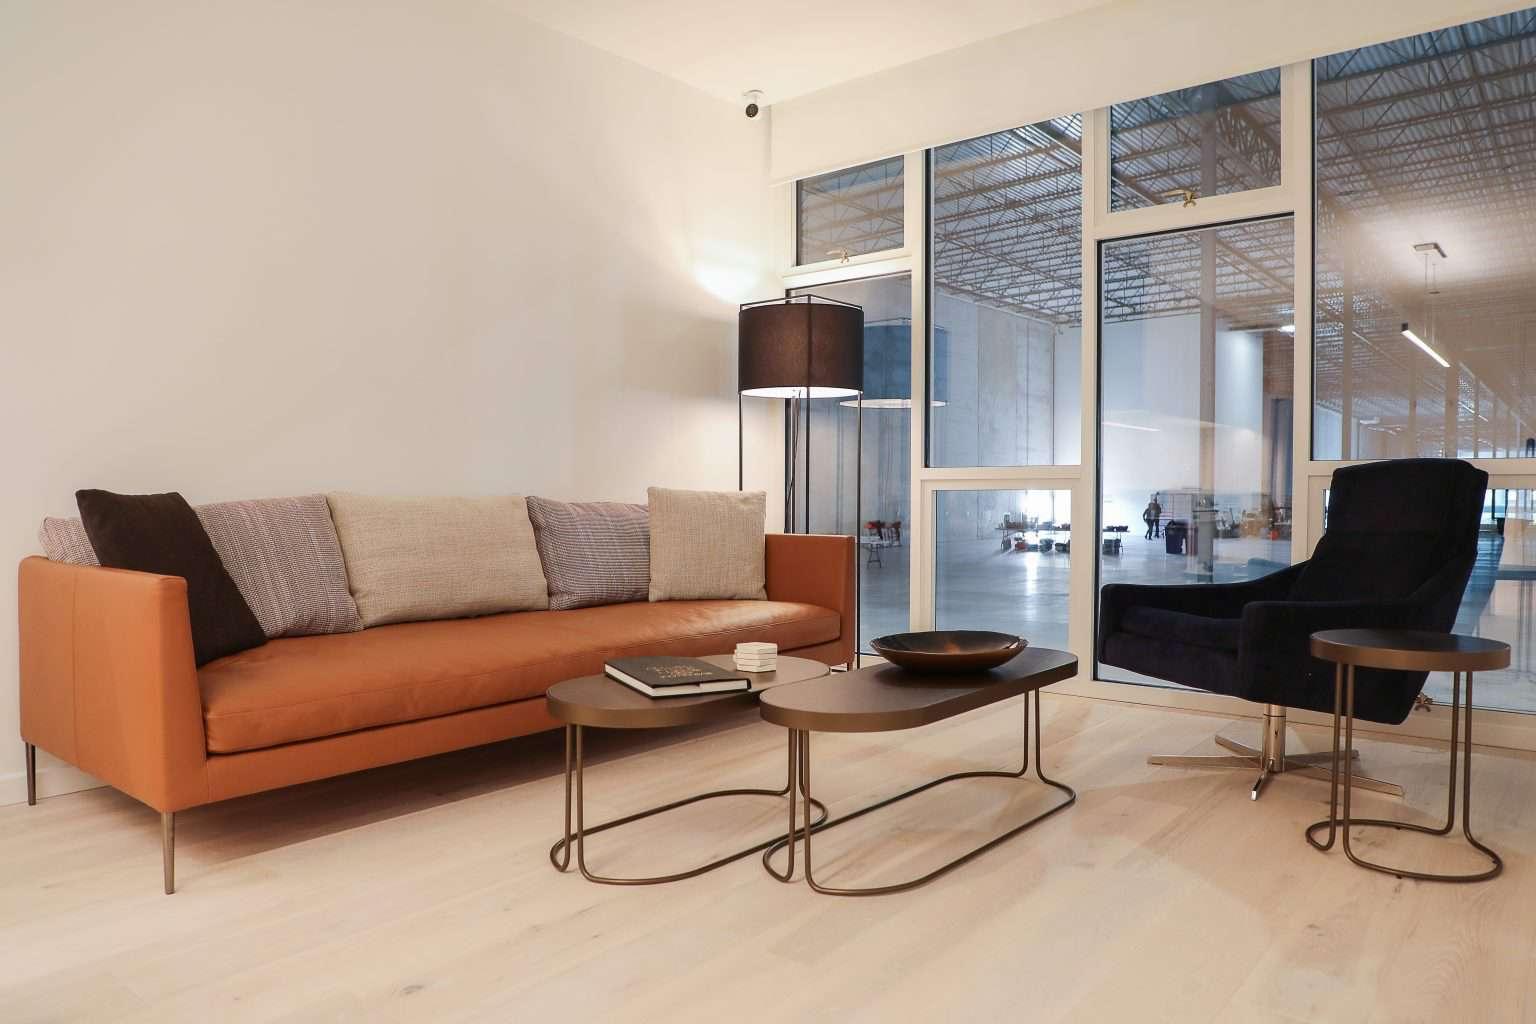 living room in modular unit